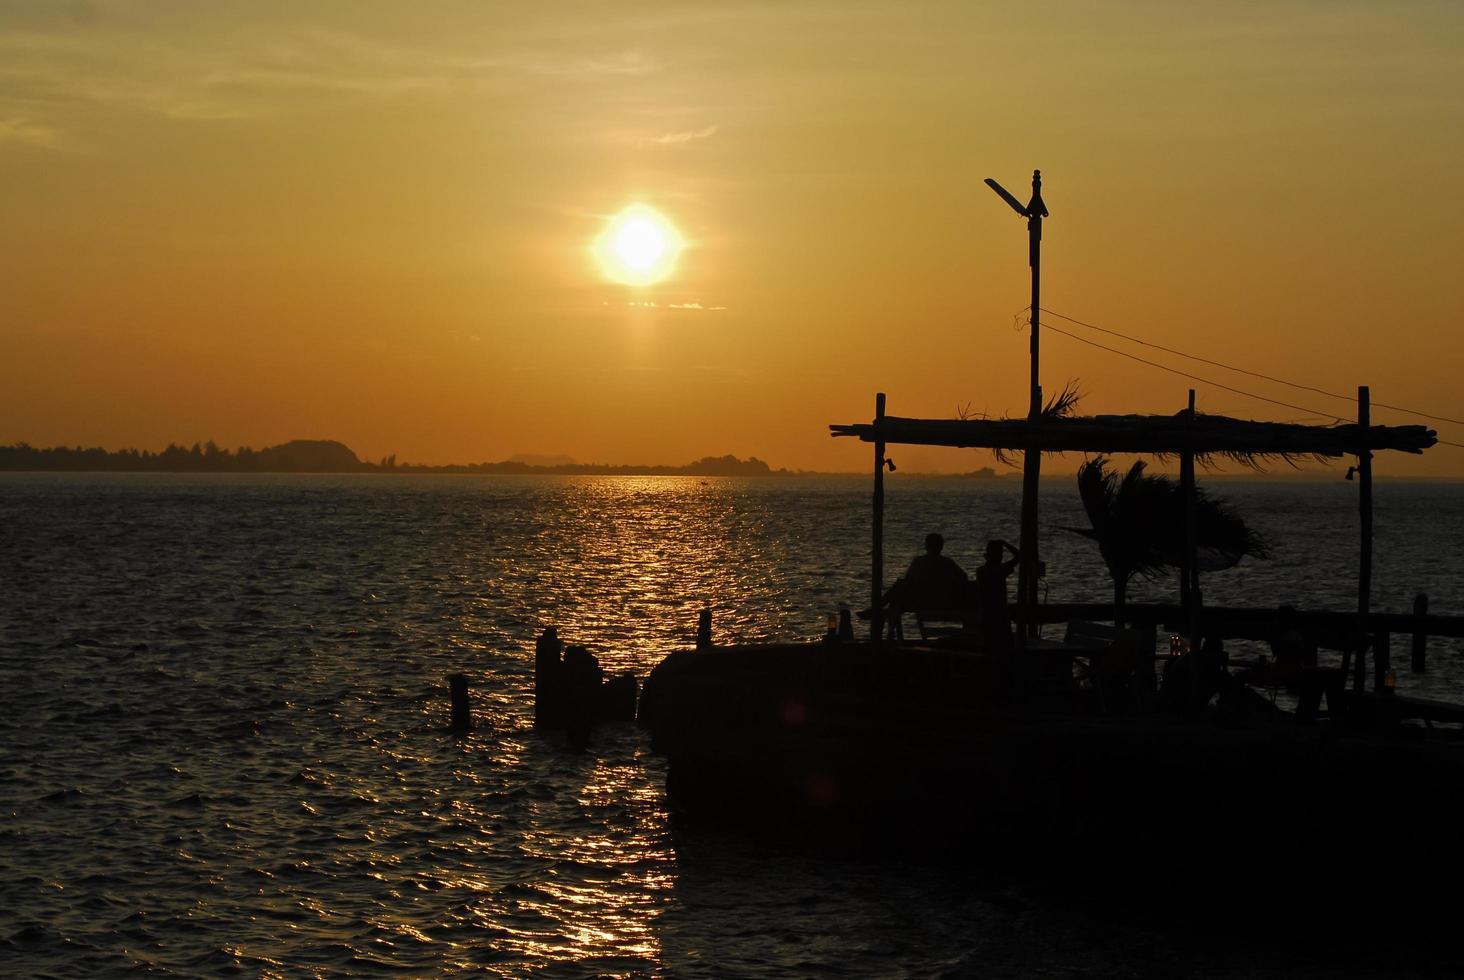 tropisk strand vid vacker gyllene solnedgång. natur bakgrund foto